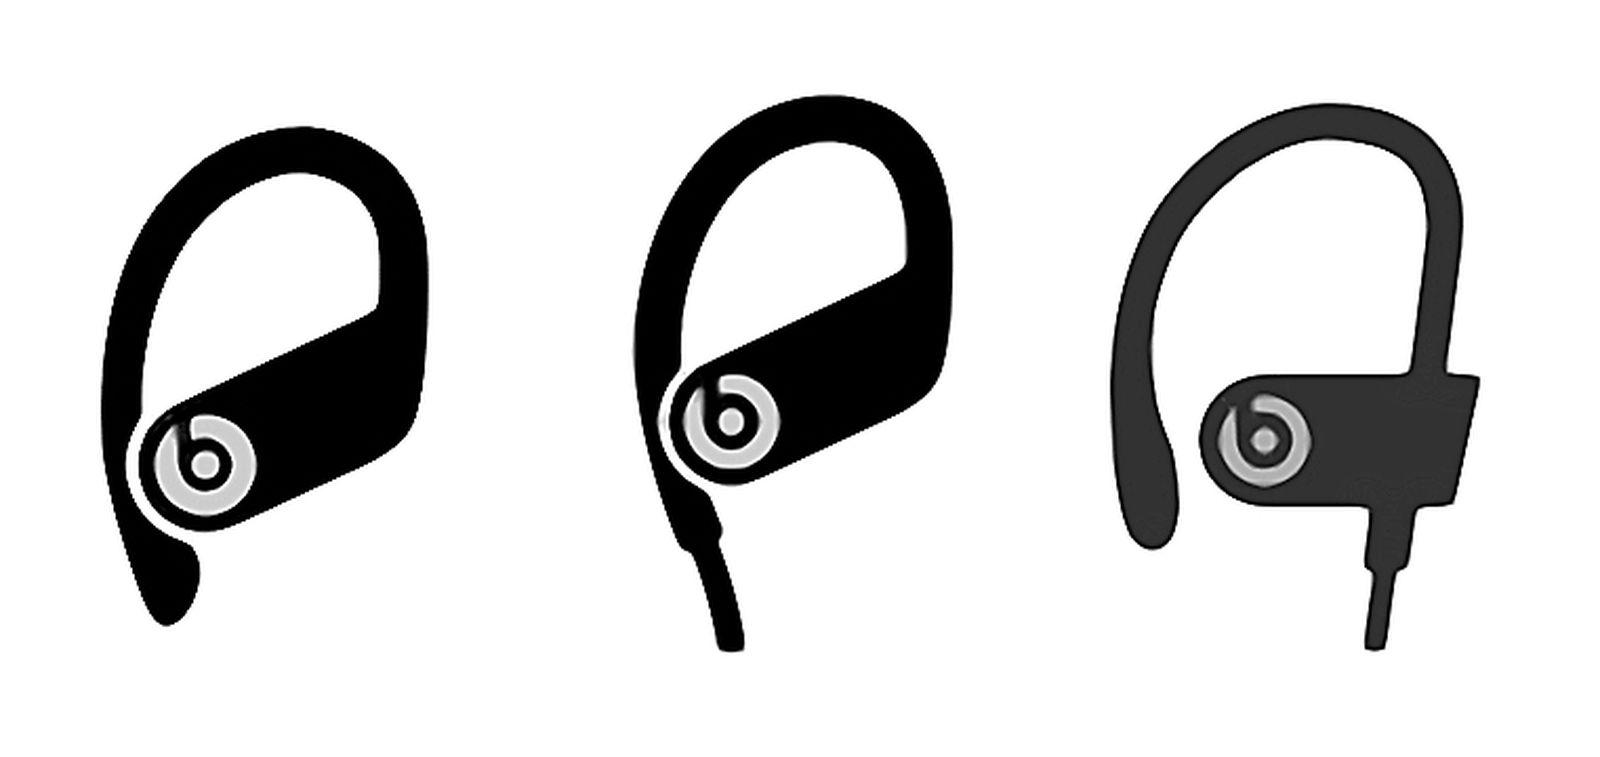 28-powerbeats-design